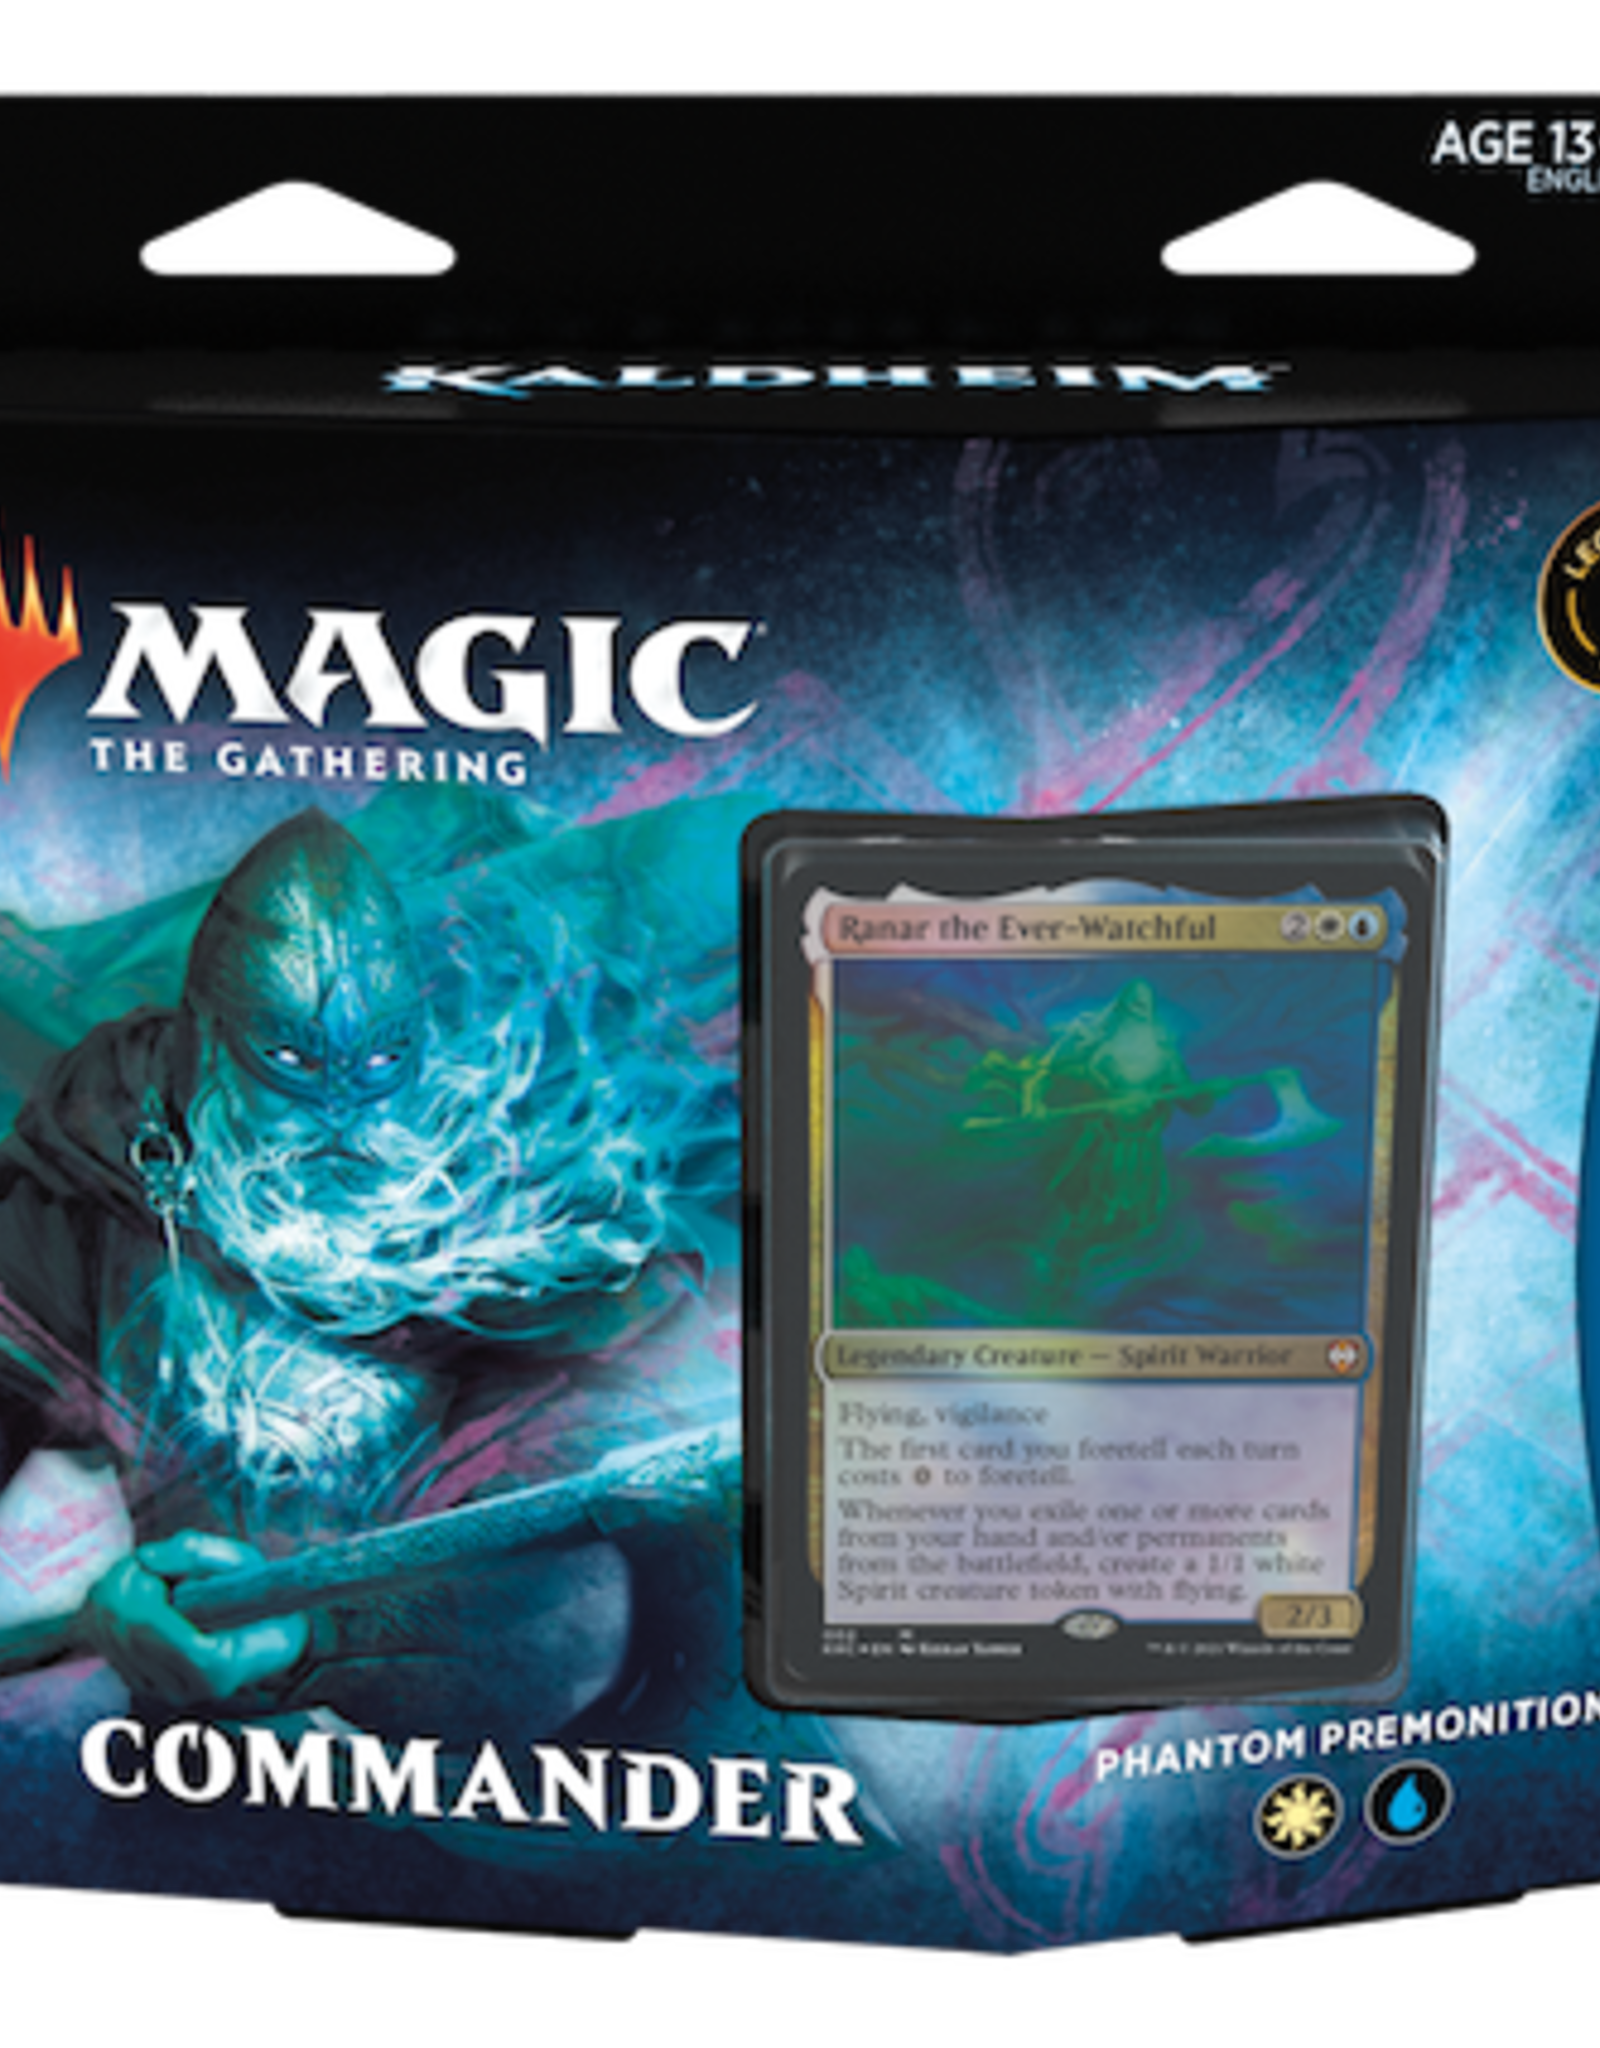 Wizards of the Coast Magic the Gathering: Kaldheim Commander Phantom Premonition (White/Blue)